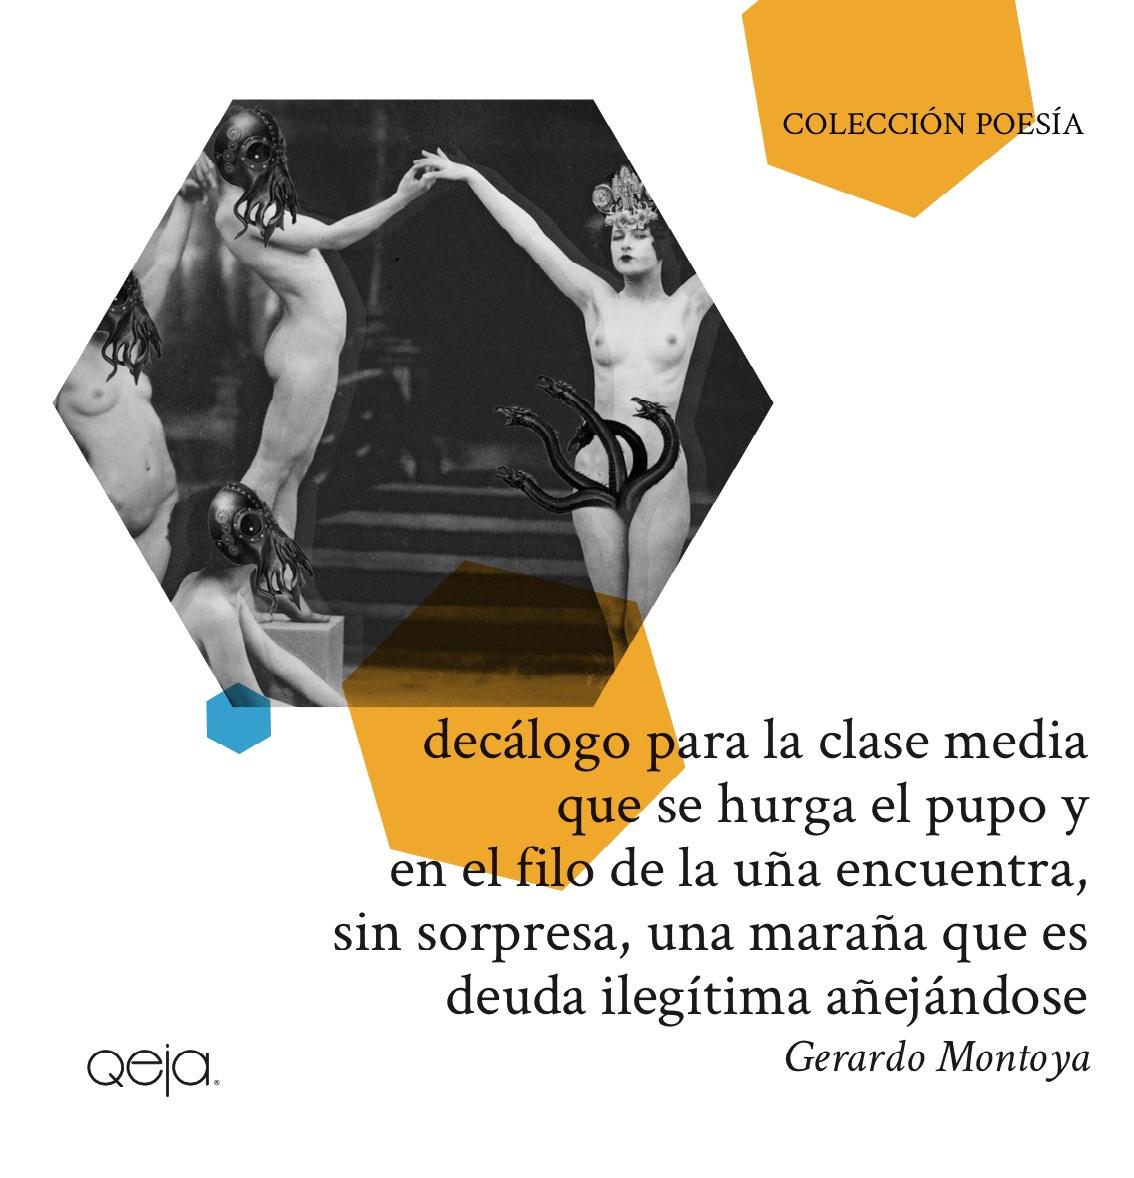 decalogo-clase-media-gerardo-montoya_.jpg